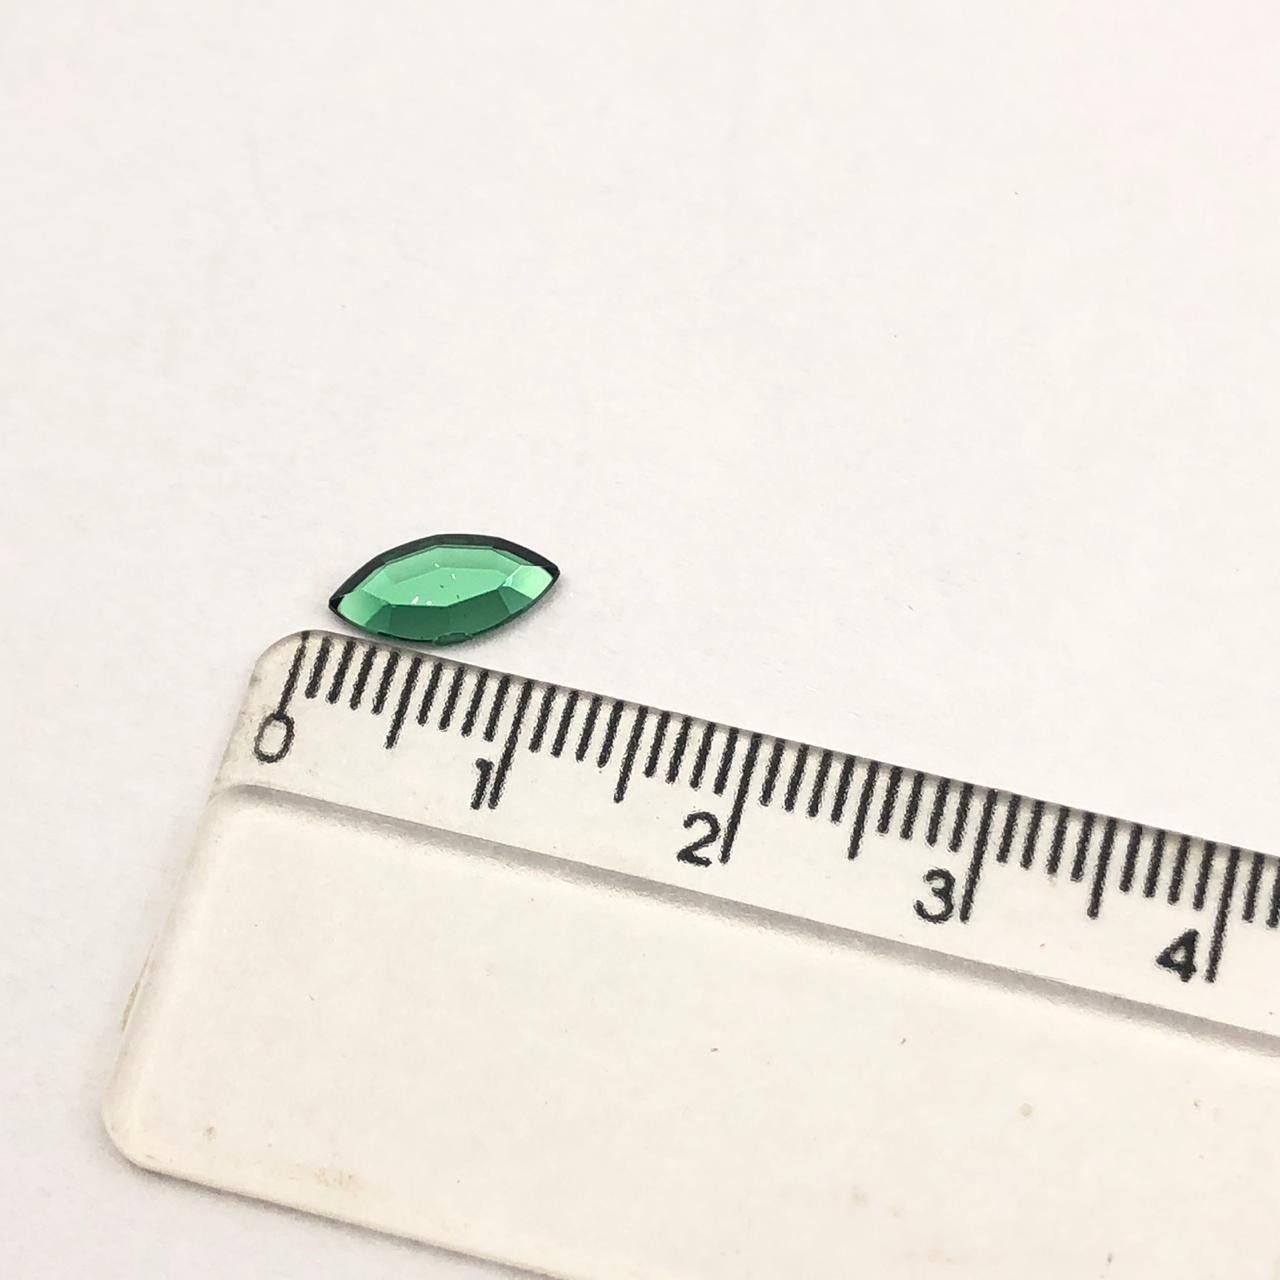 CHT1507 - Chaton Navete Green Turmaline 5x10 - 10unids